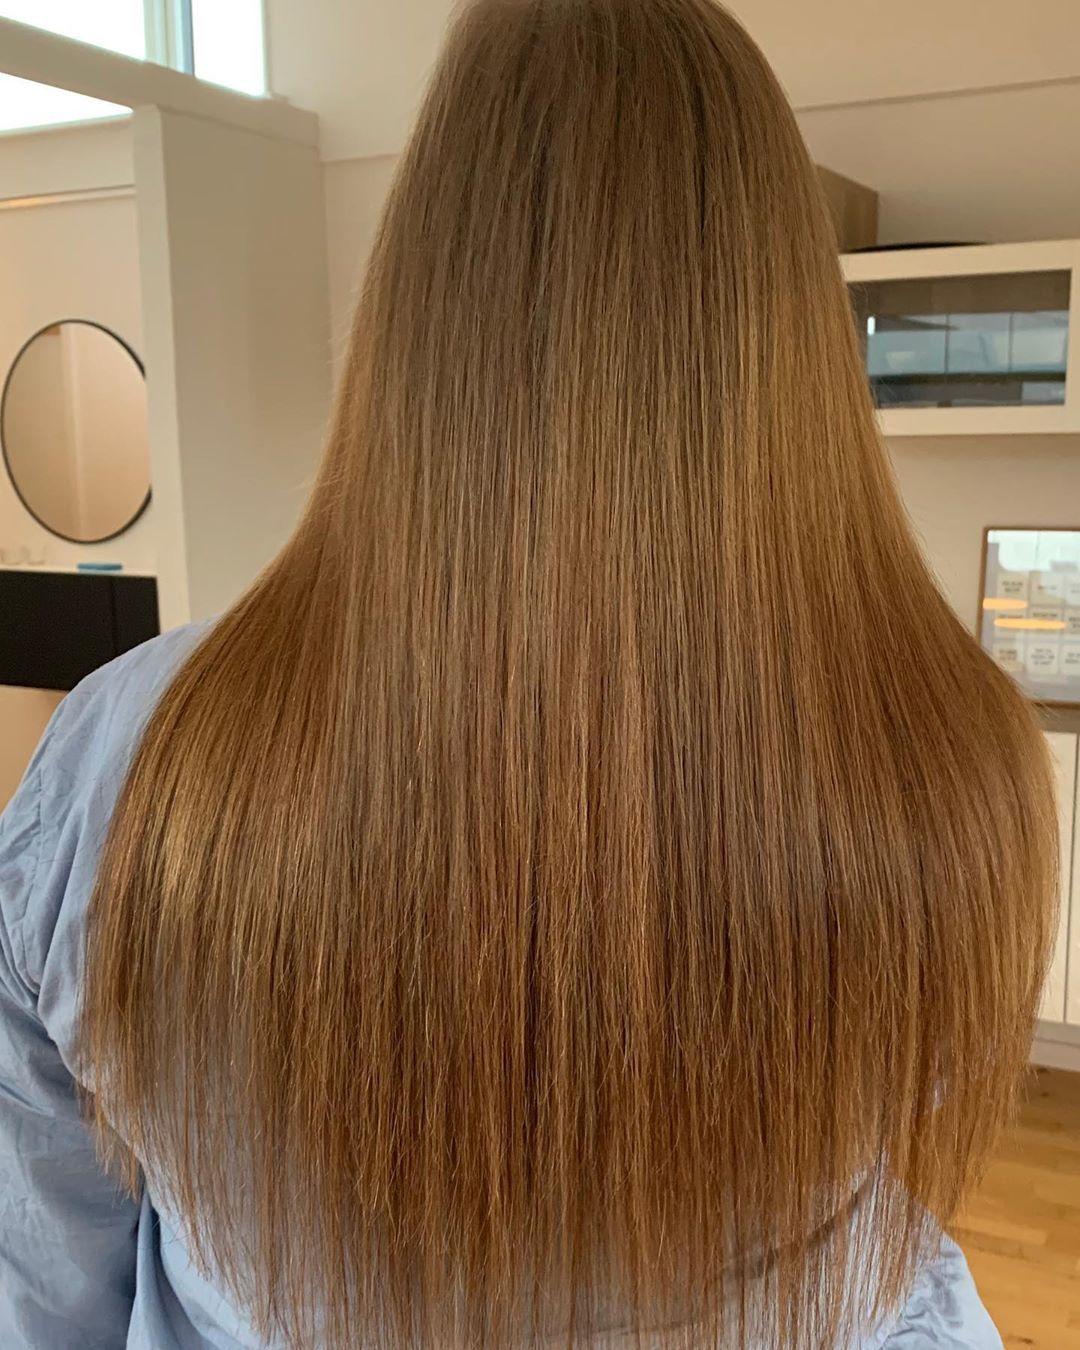 Tumblr In 2020 Long Hair Styles Hair Styles Beauty